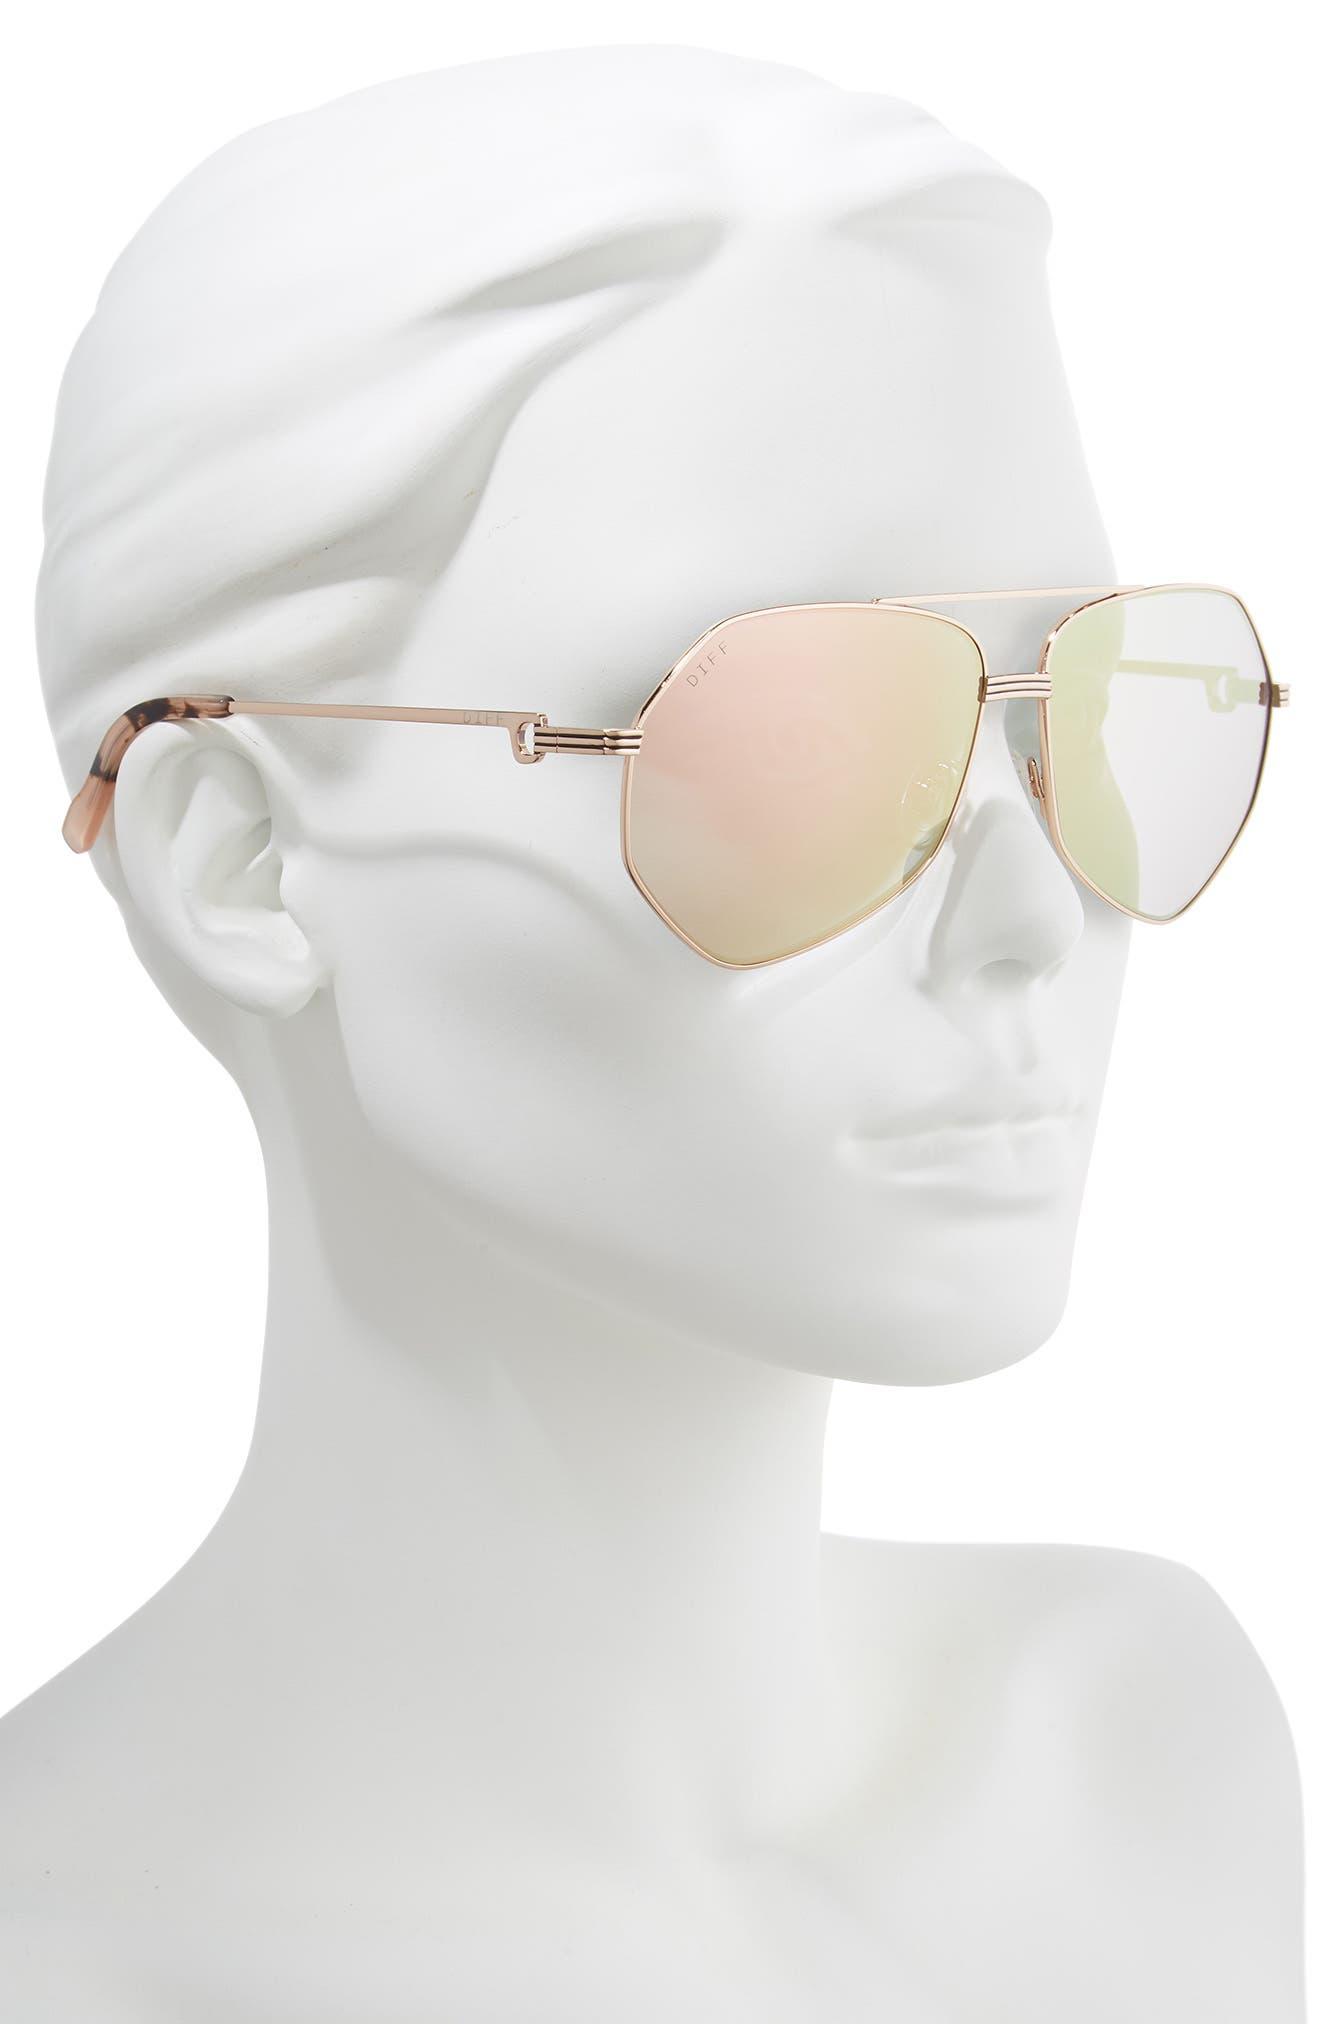 Sydney 62mm Polarized Aviator Sunglasses,                             Alternate thumbnail 2, color,                             GOLD/ HIMALAYAN/ CHAMPAGNE